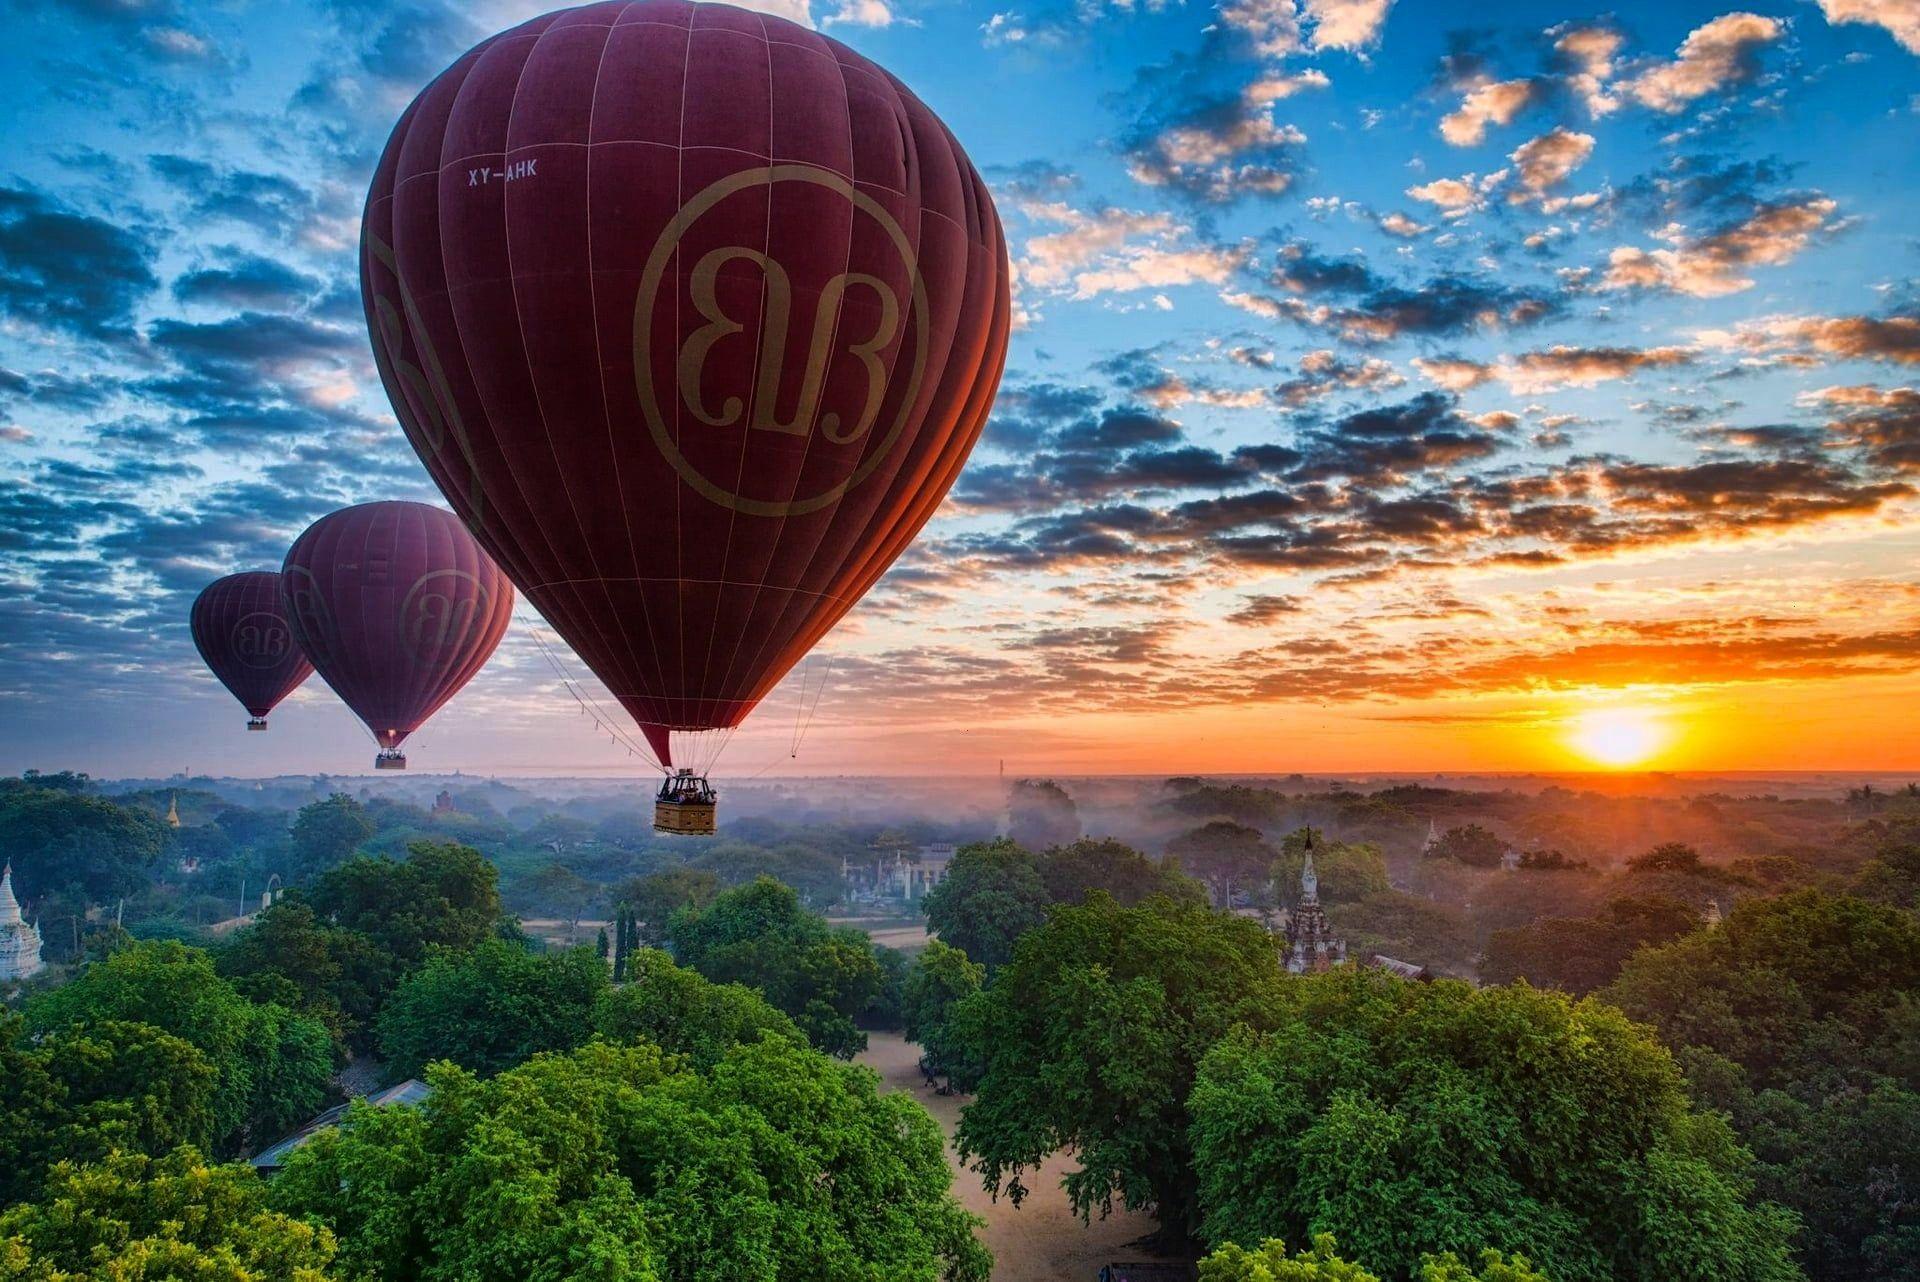 #hdwallpaper #wallpaper #panorama #balloons #myanmar #desktop #sunset #burma #bagan #pagan #1080p #three #pink #sky #thethree pink hot air balloons the skythree pink hot air balloons the sky  Take a look at our fairytale air balloon flight in Cappadocia.  . . .  hot air ballooning  Hot air ballooning in Cappadocia, Turkey  Blumenmarkt, Vietnam  Life holds special magic for those who dare to dream ... ✭☾٠·˙✧ via @nois7 💫  Bali's Longest Infinity Pool at Padma Resort Ubud  singapore_reflect...